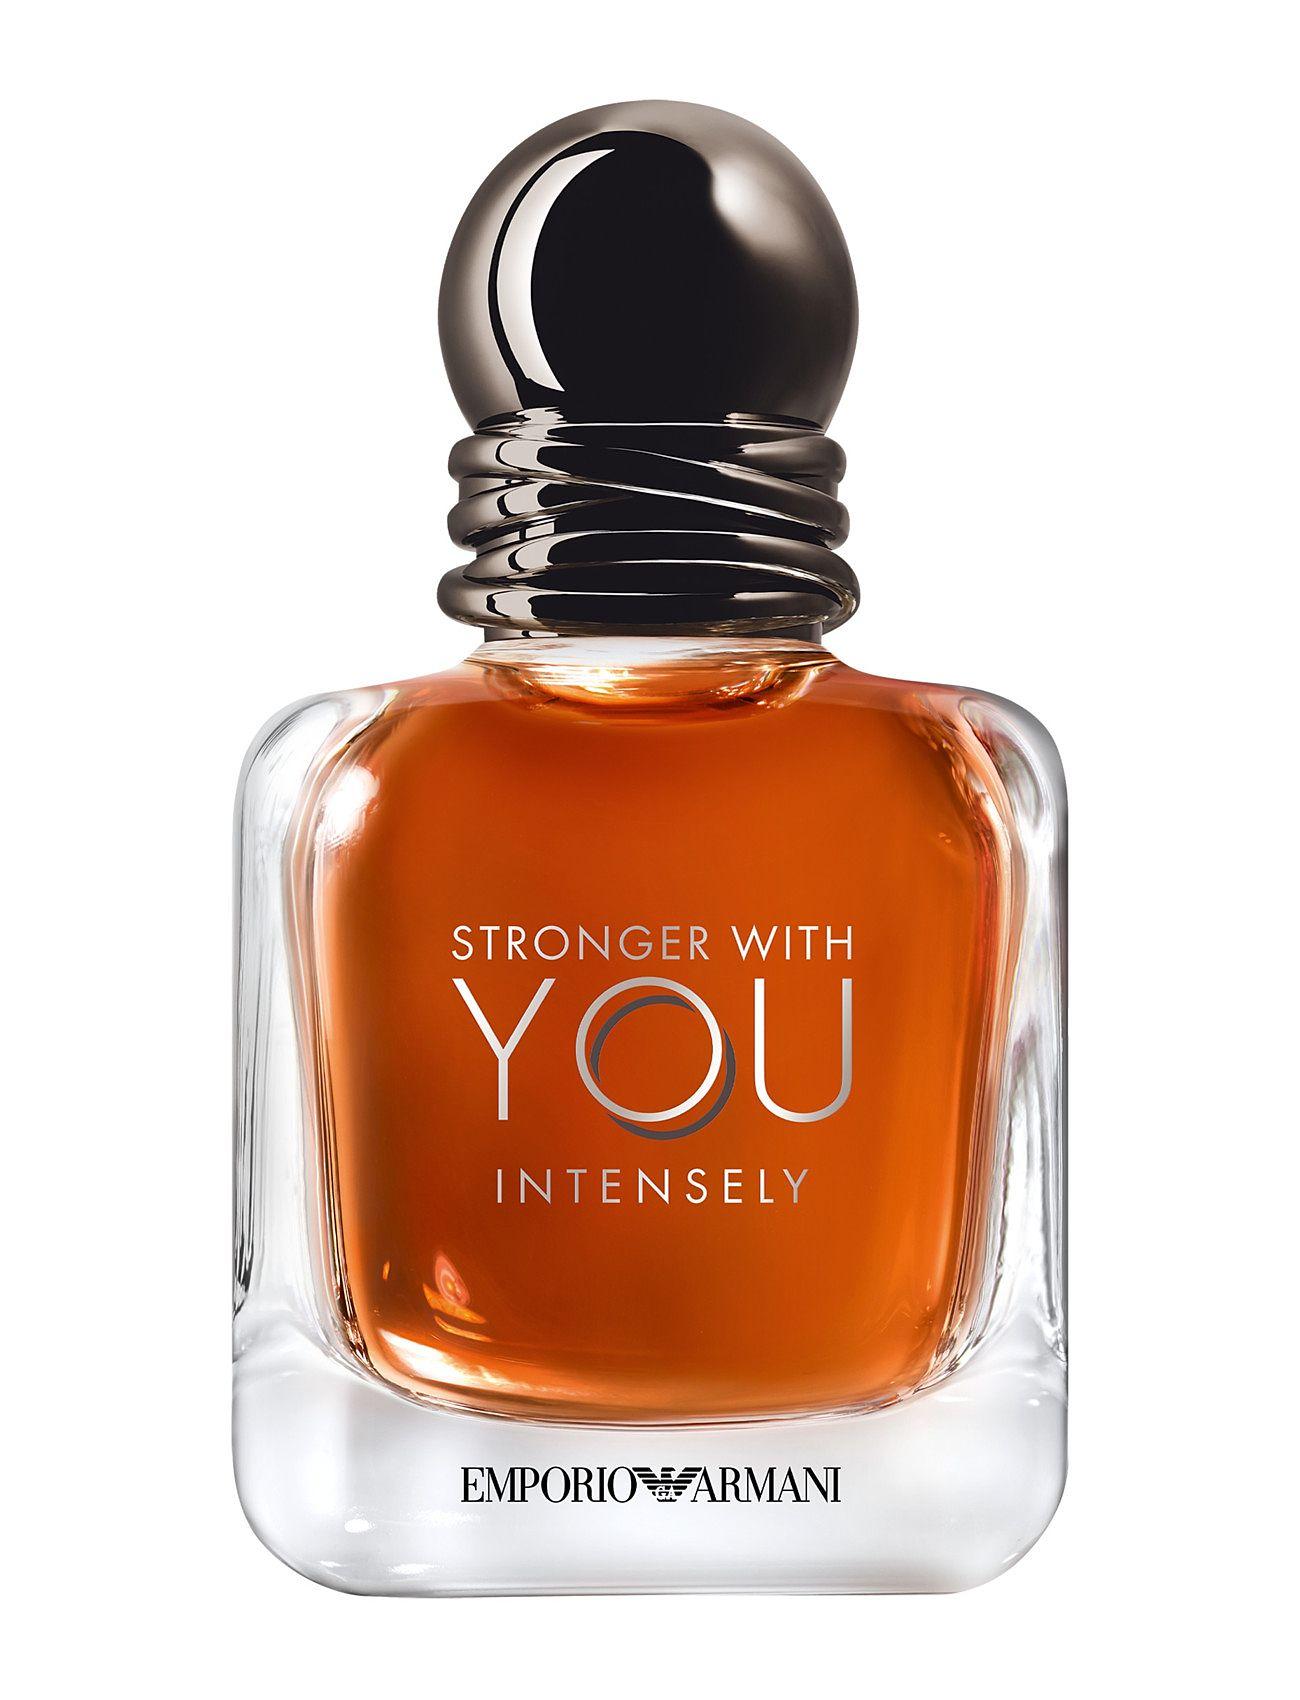 Giorgio Armani Emporio Armani Stronger With You Intensely Edp 30 ml - CLEAR